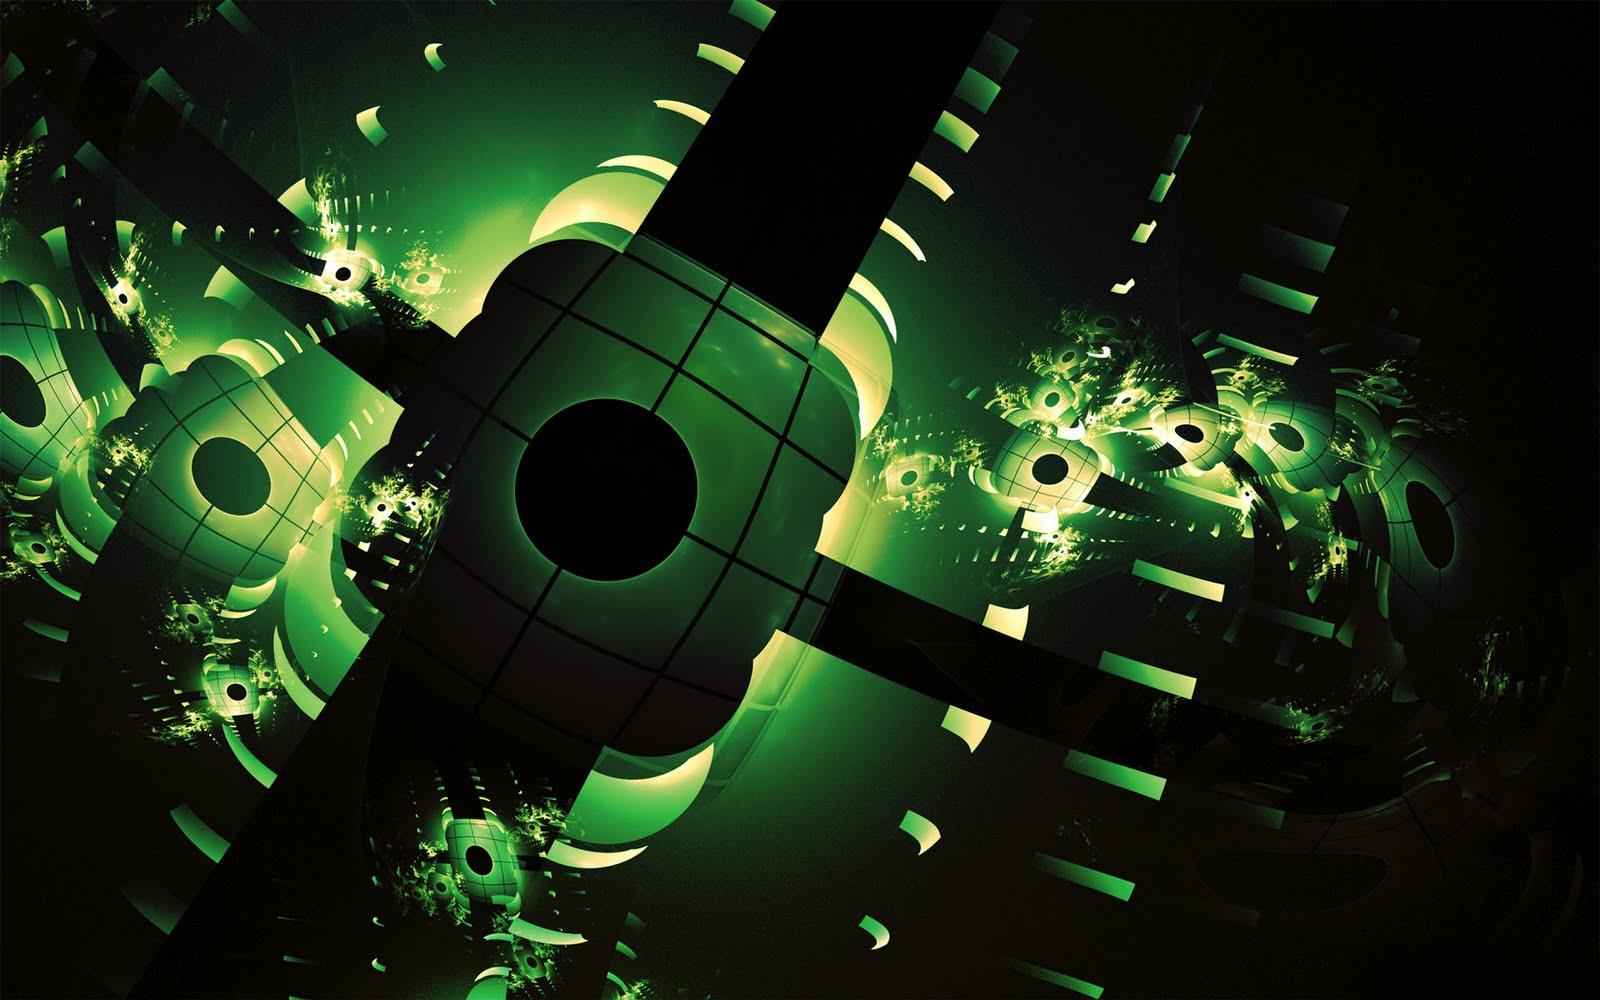 cool wallpaper hd | hd wallpapers pulse